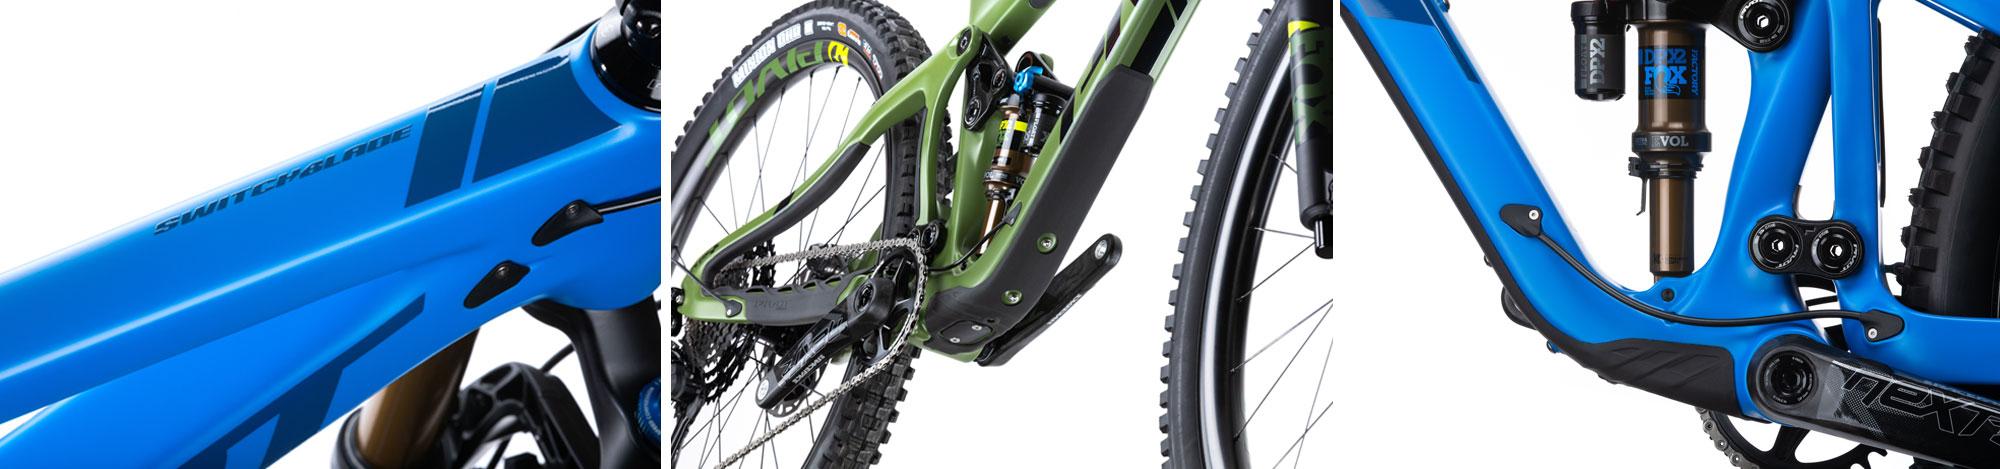 Pivot Switchblade 2020 Elevation Cycles Colorado Specs